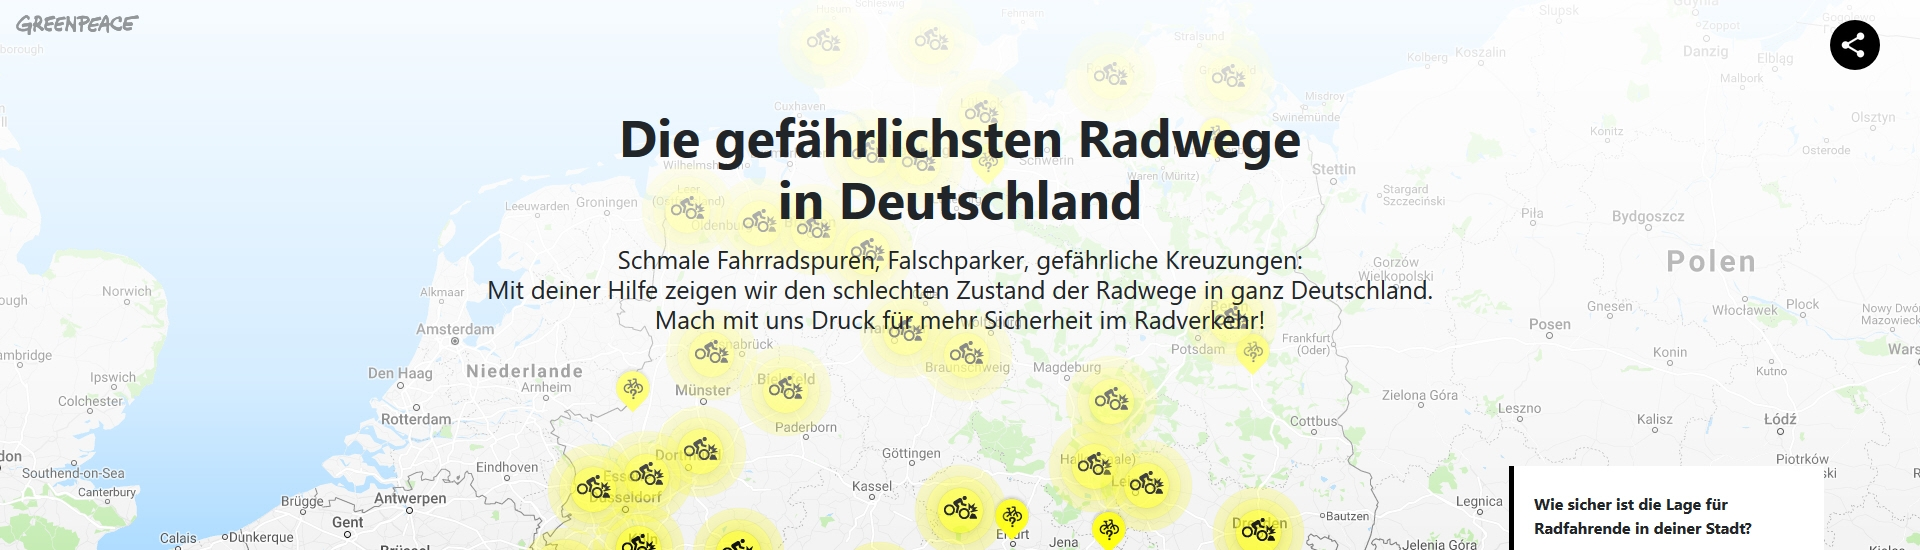 Greenpeace Kampagne #Radgefahren